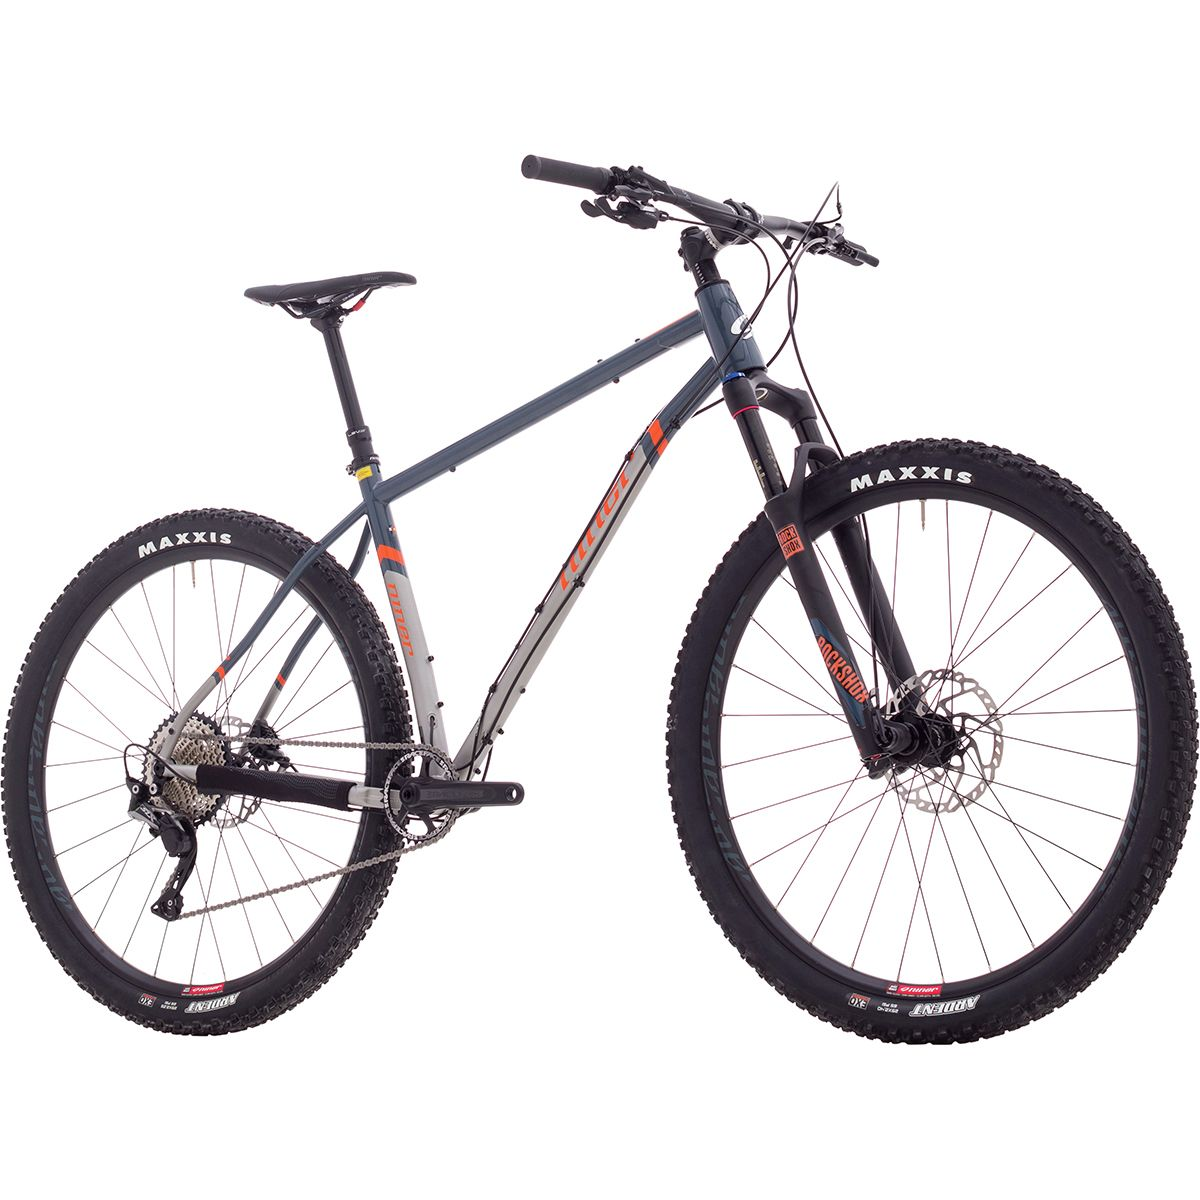 Niner SIR 9 29 2-Star SLX Complete Mountain Bike - 2017 ...